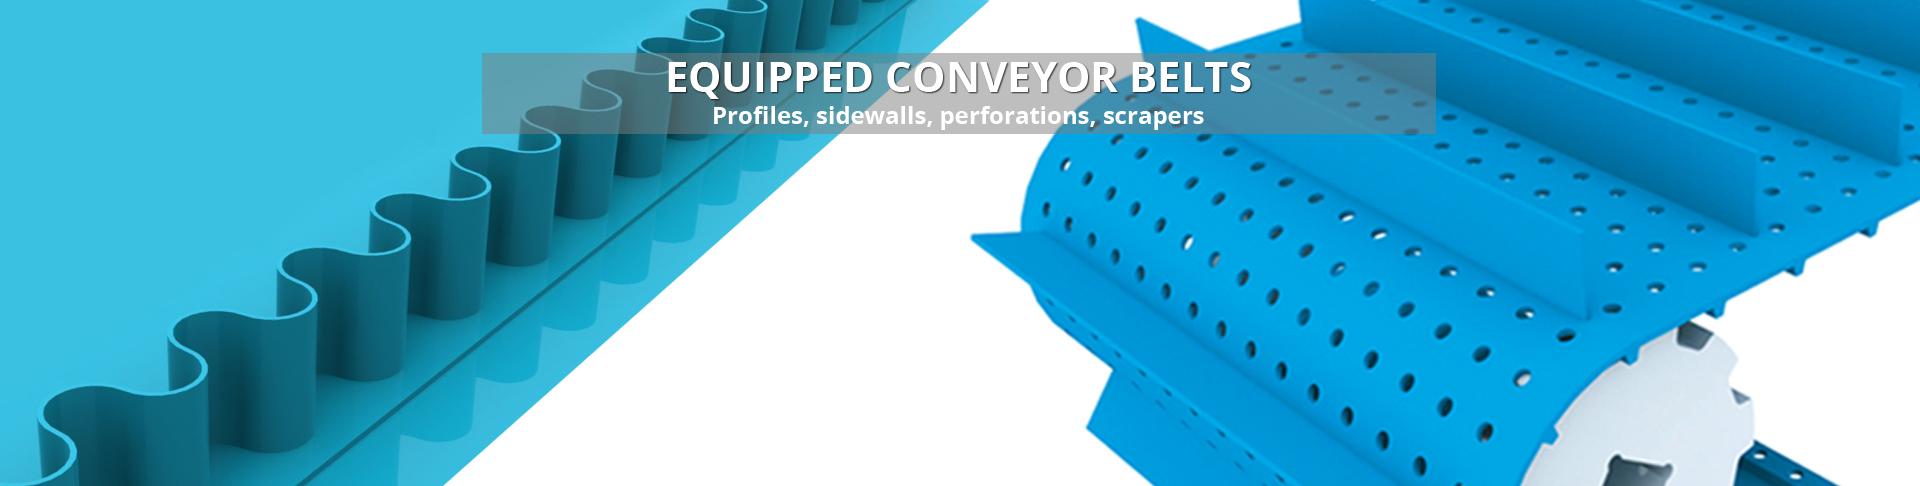 equipped-conveyor-belts-slide